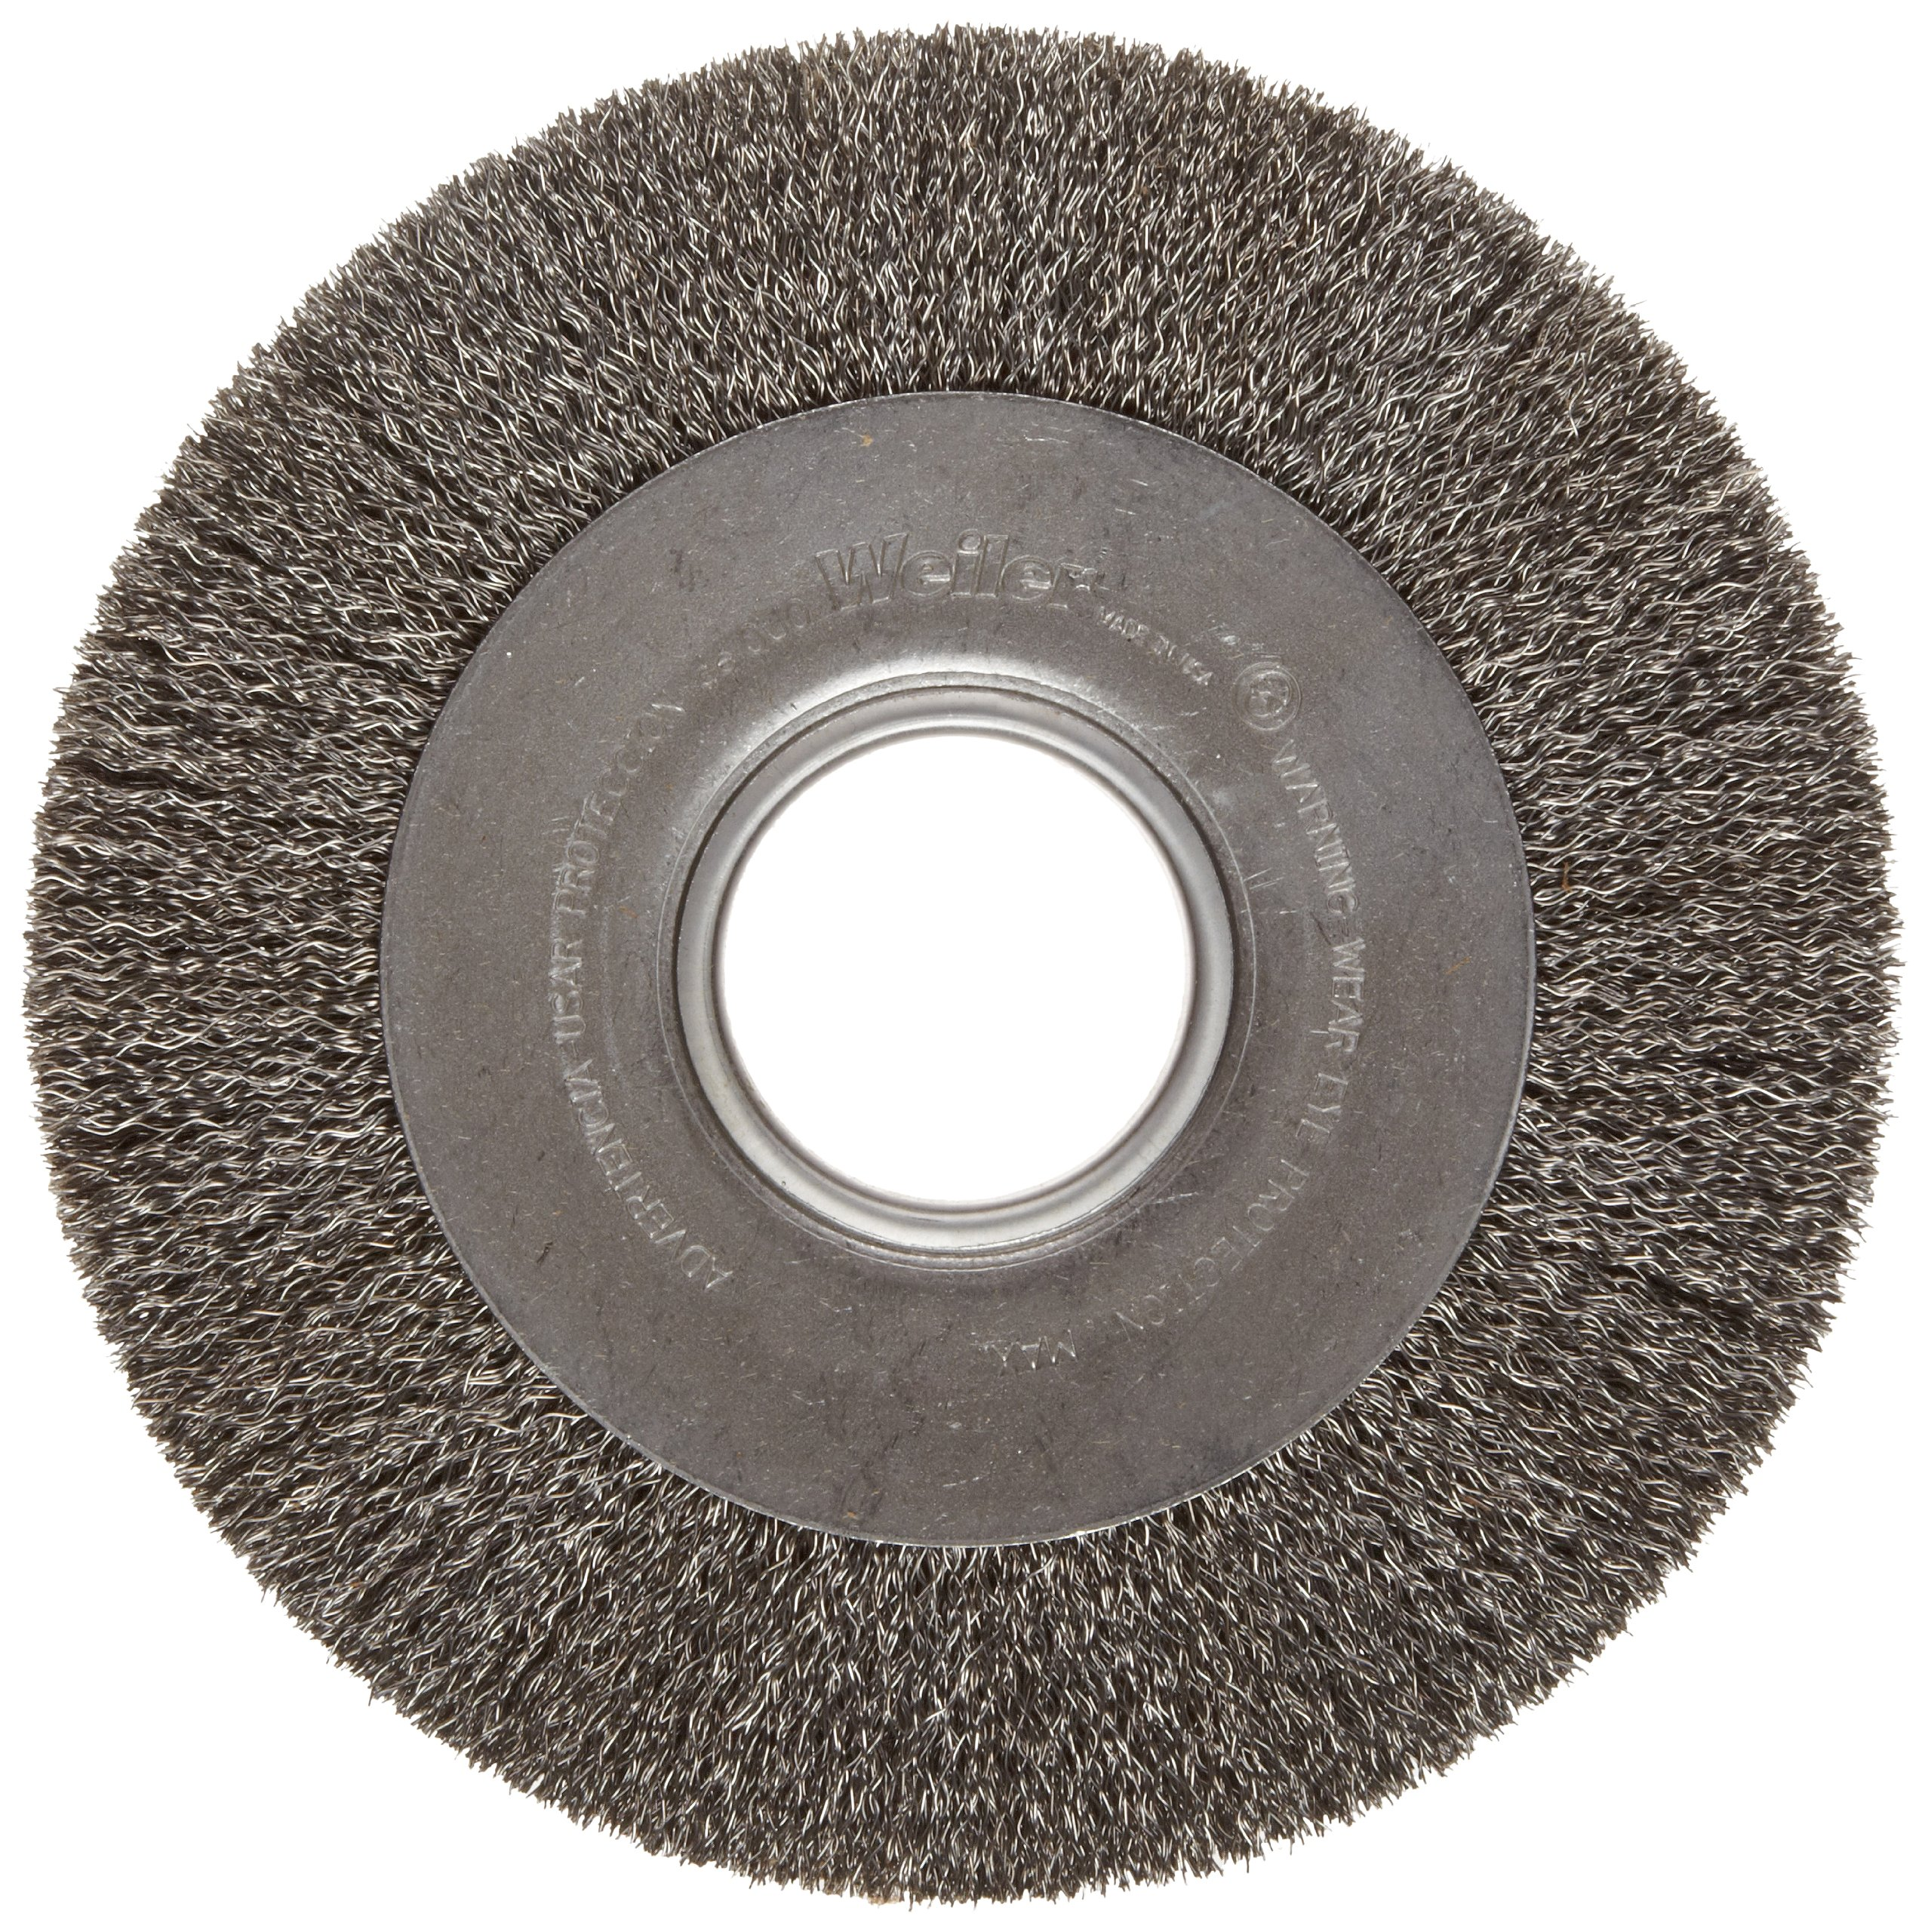 Weiler Trulock Medium Face Wire Wheel Brush, Round Hole, Steel, Crimped Wire, 8'' Diameter, 0.014'' Wire Diameter, 2'' Arbor, 1-3/8'' Bristle Length, 1'' Brush Face Width, 4500 rpm